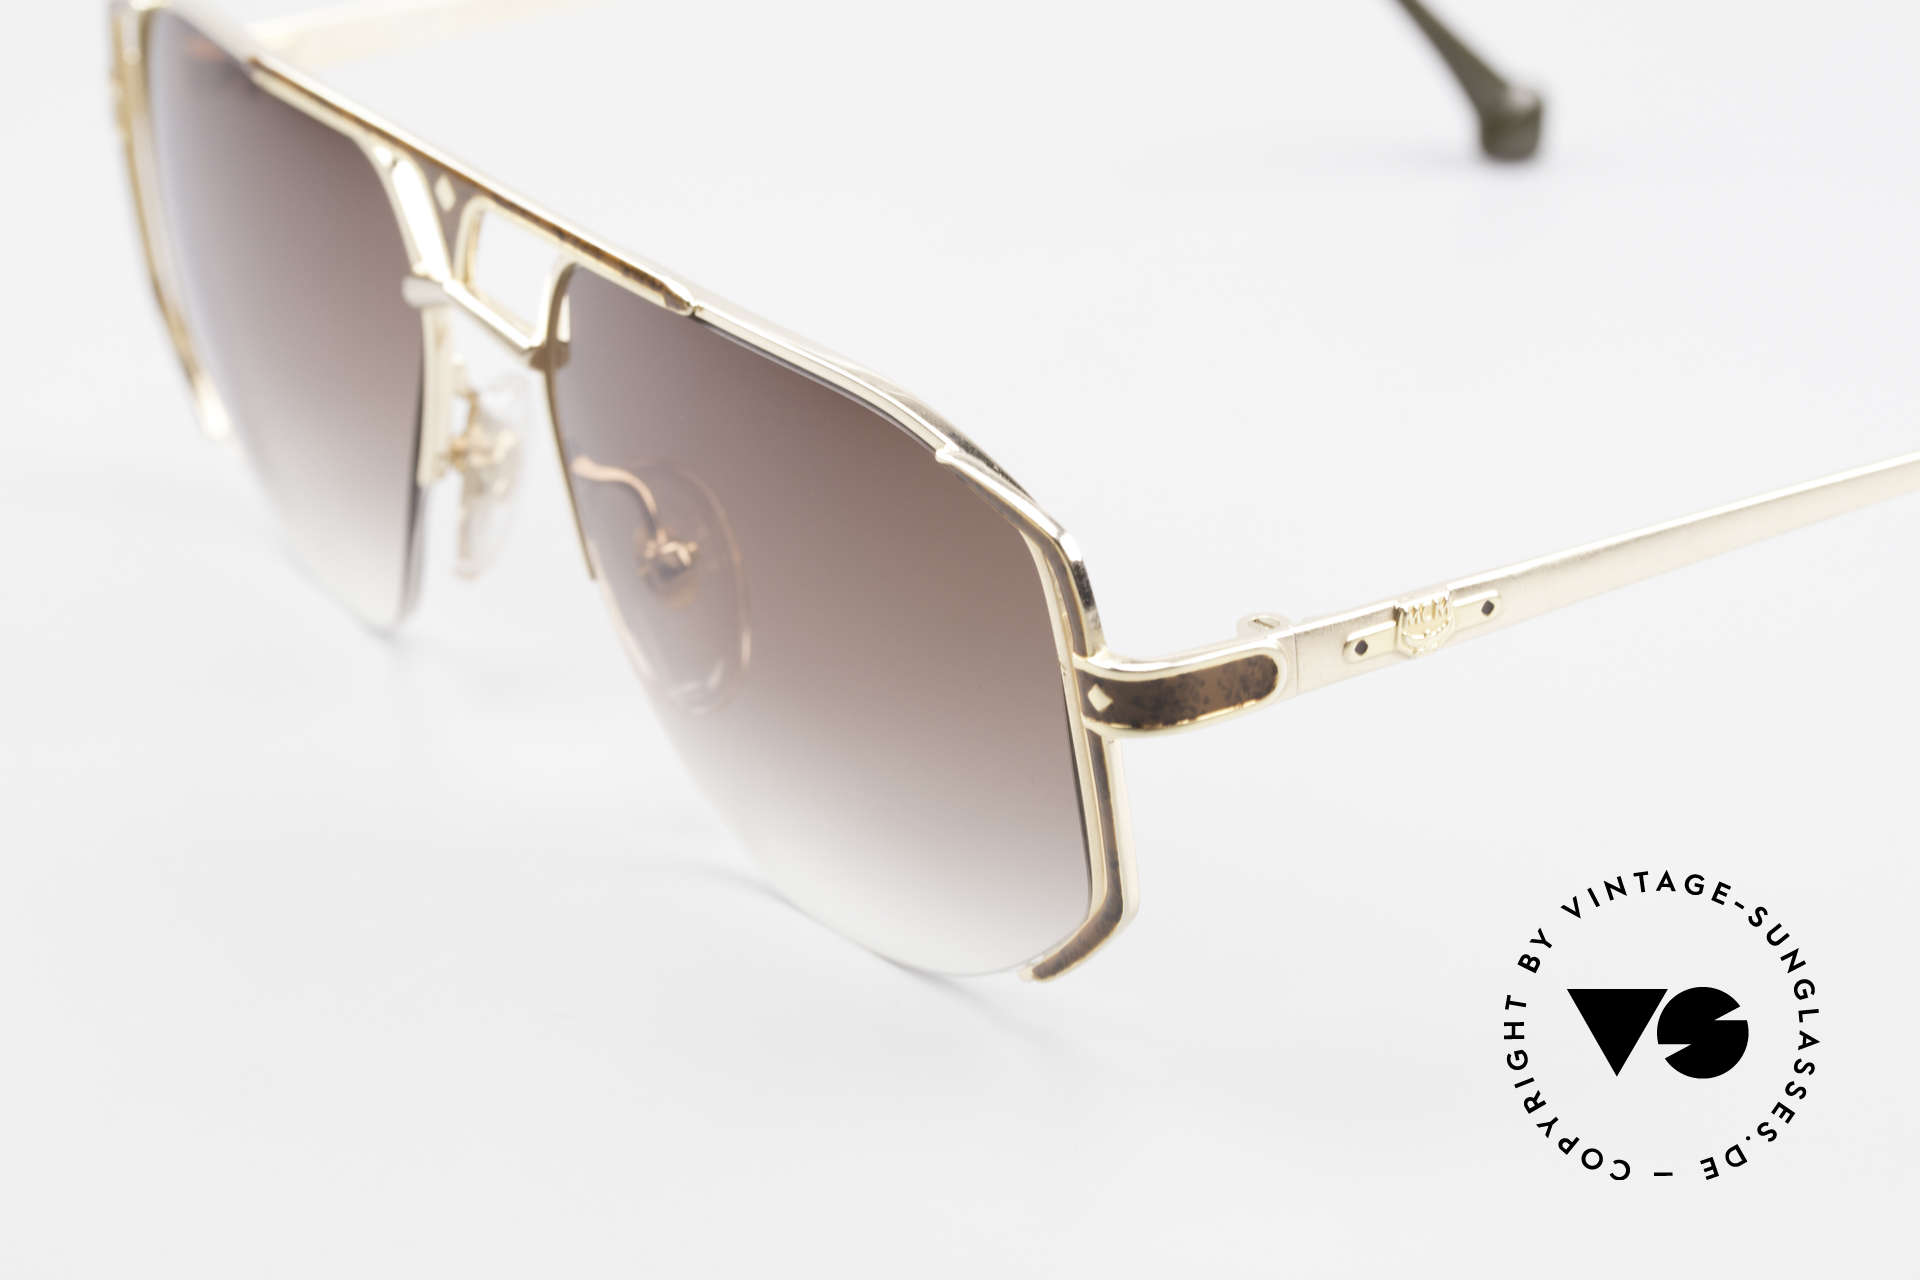 MCM München 5 Titanium Sunglasses Large, unworn, NOS (like all our old vintage MCM ORIGINALS), Made for Men